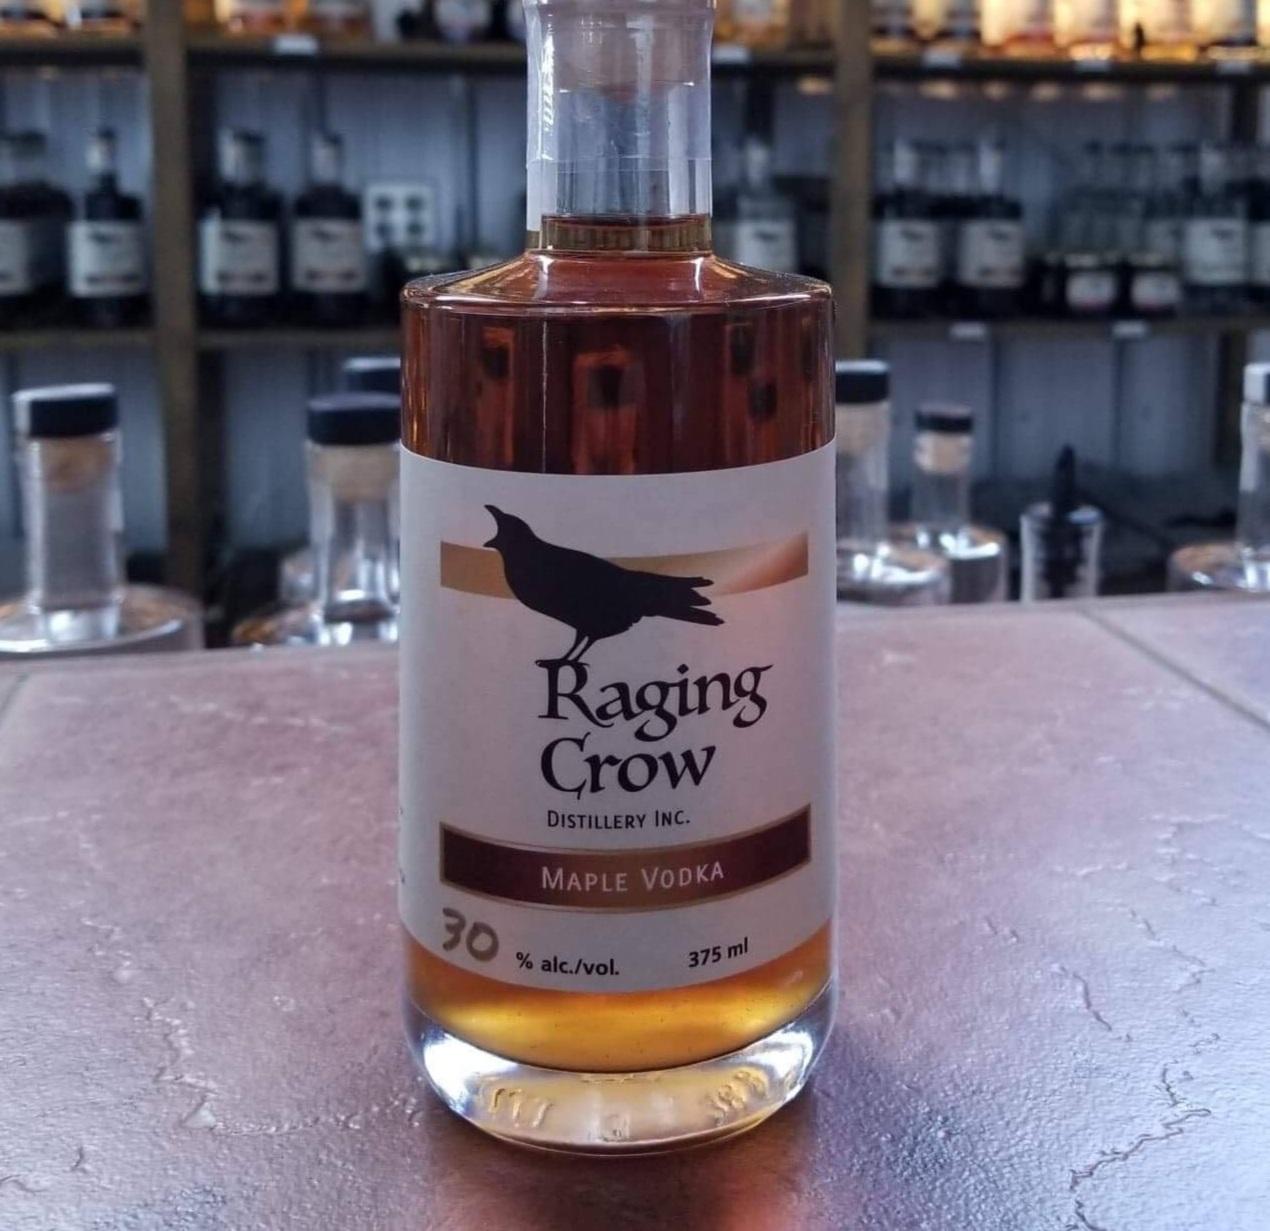 Maple Vodka Cocktail - 1.5 oz Raging Crow Maple Vodka1 oz Raspberry/Cherry/Strawberry Liqueur3 oz Orange Juice